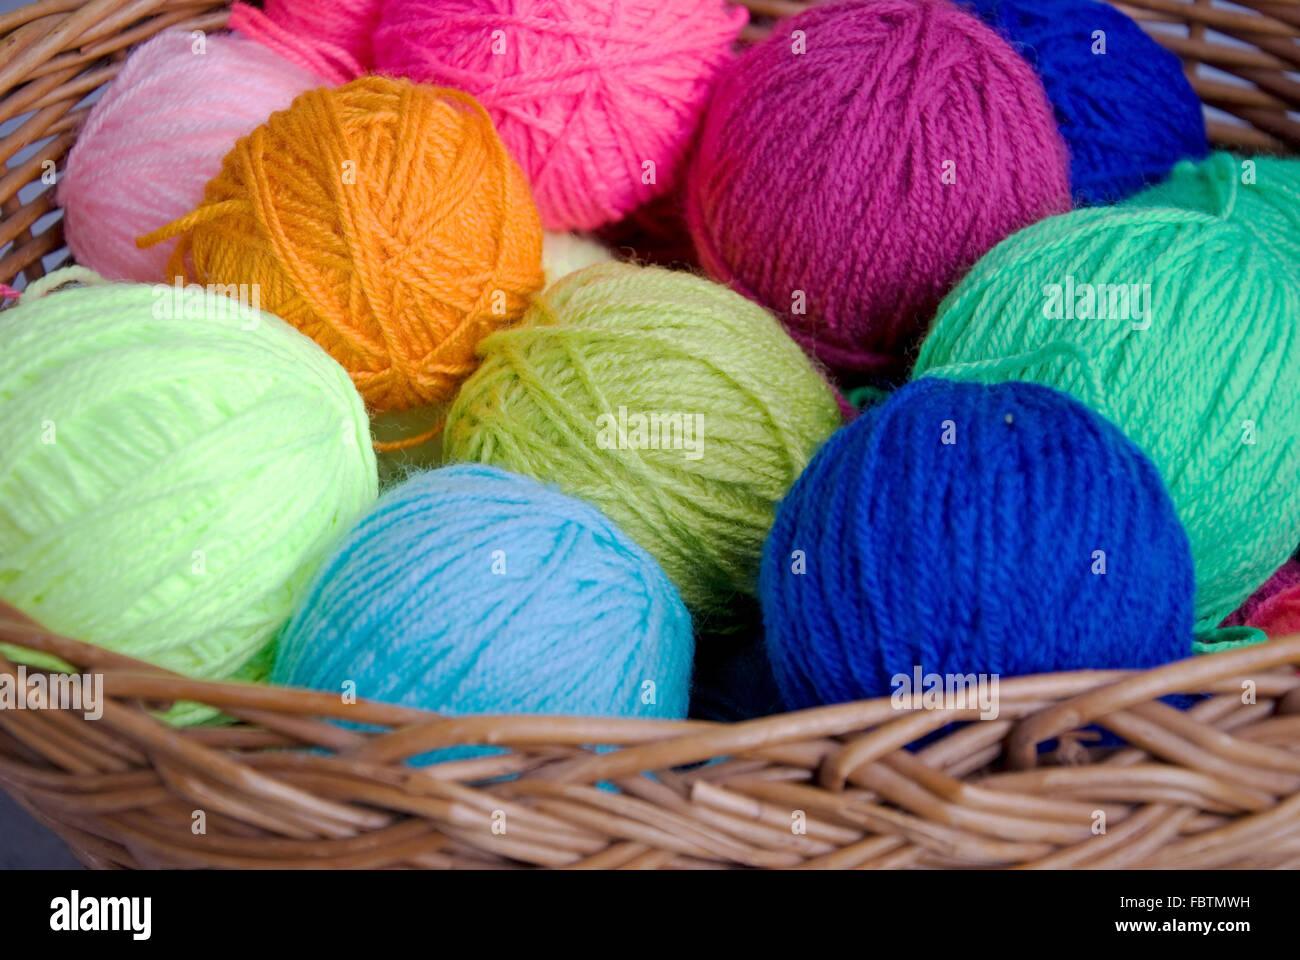 knittingbasket and wool - Stock Image